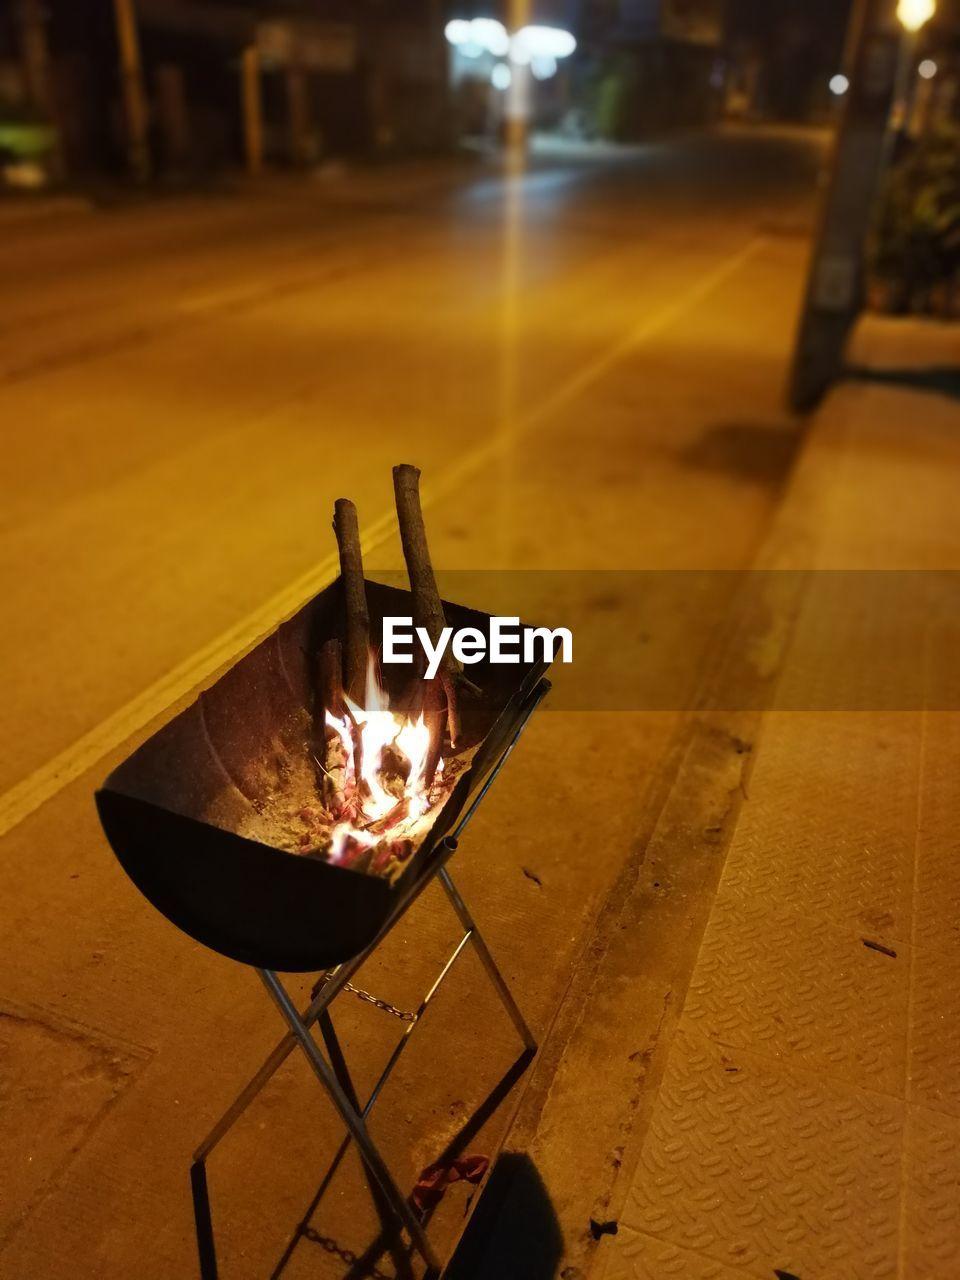 flame, burning, heat - temperature, glowing, night, metal, no people, outdoors, fire pit, illuminated, close-up, diya - oil lamp, food, oil lamp